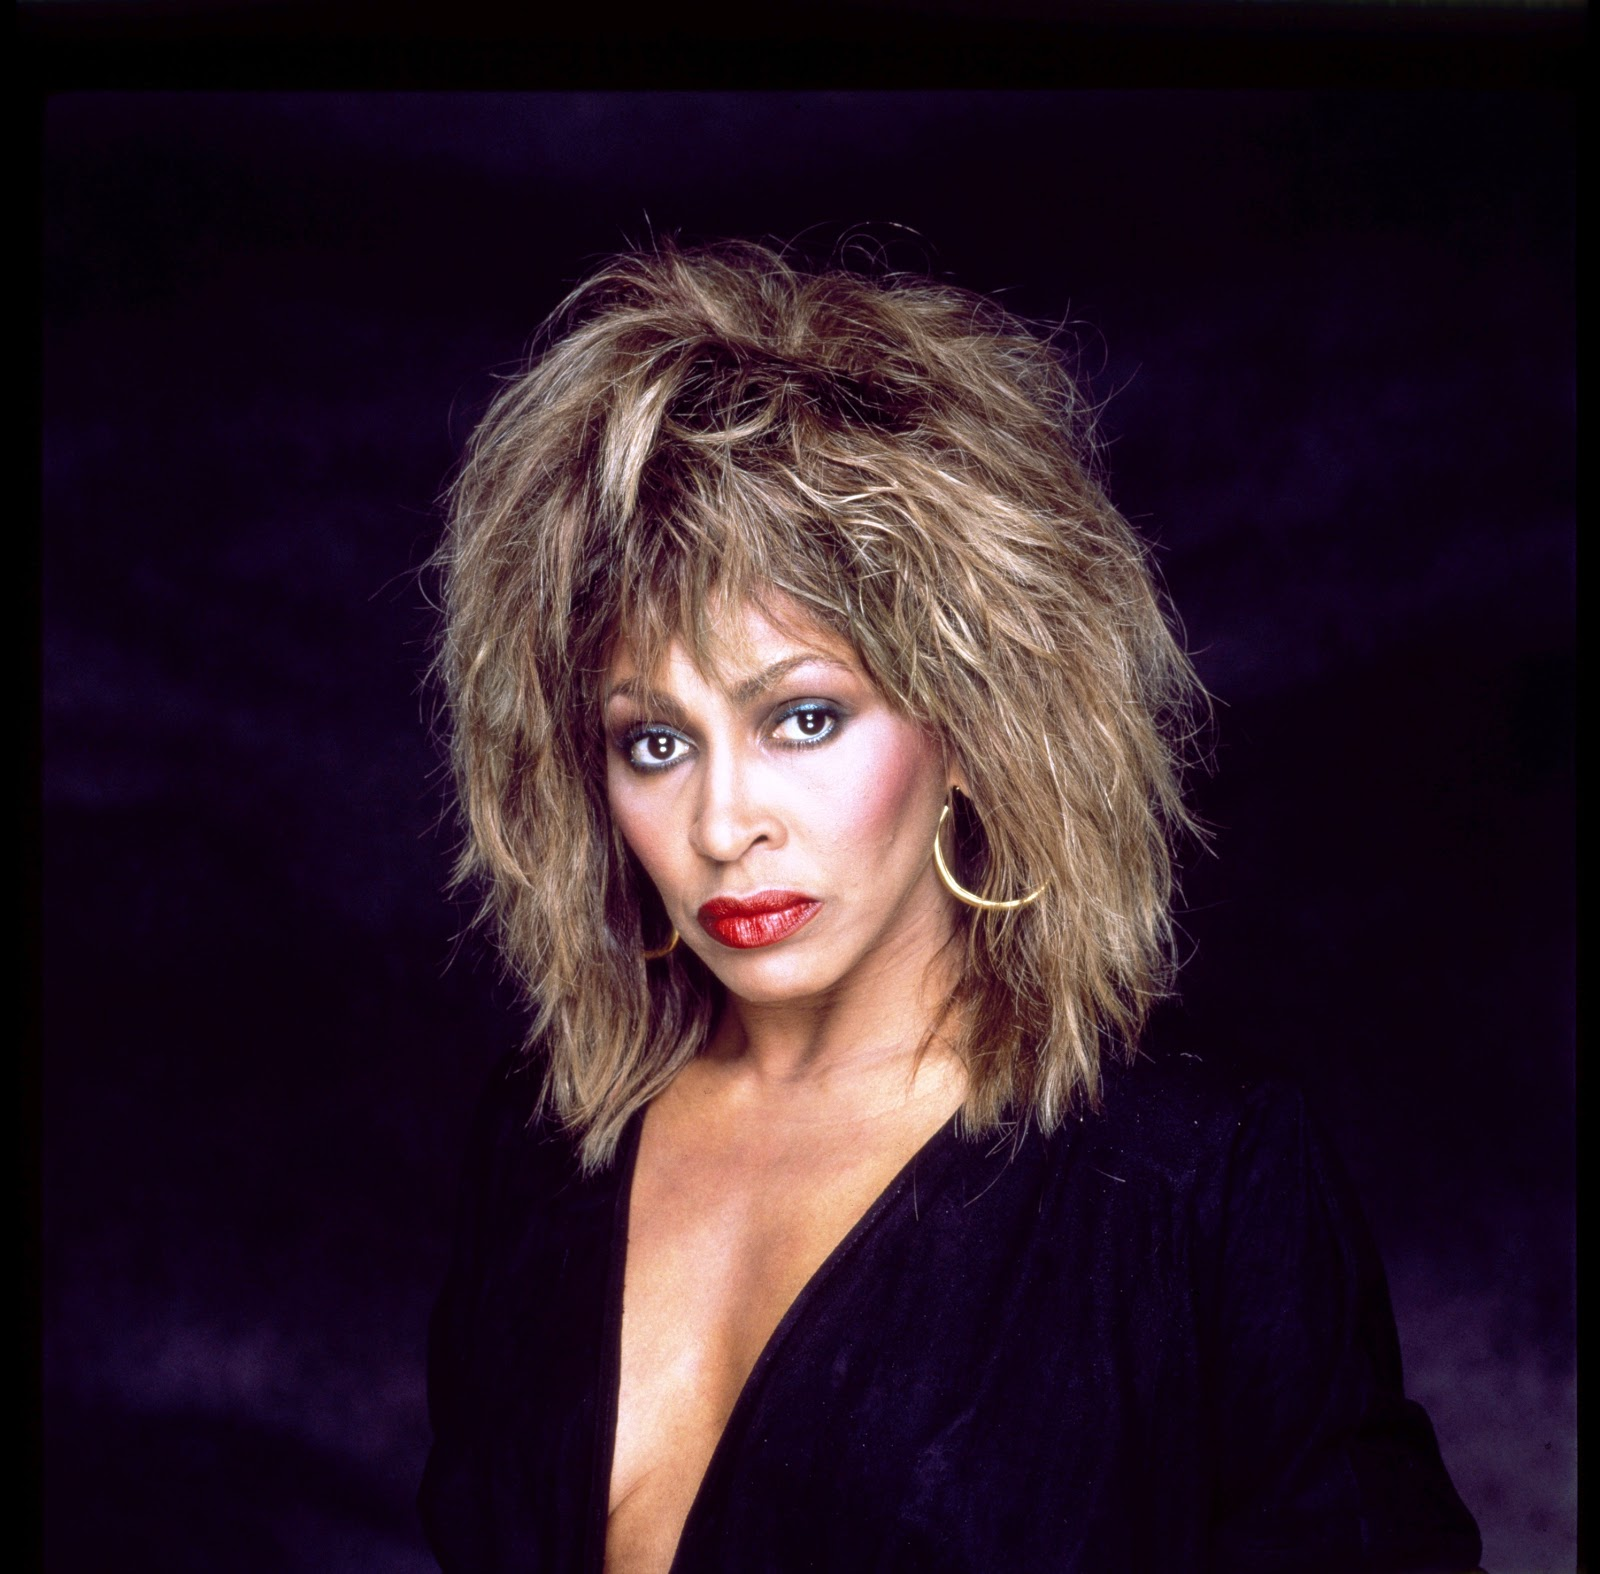 http://4.bp.blogspot.com/-TzzFF37_qwc/UInEw2Mw0GI/AAAAAAAAa_0/i4Q14QGCOwI/s1600/Tina_Turner-rock-star.jpg